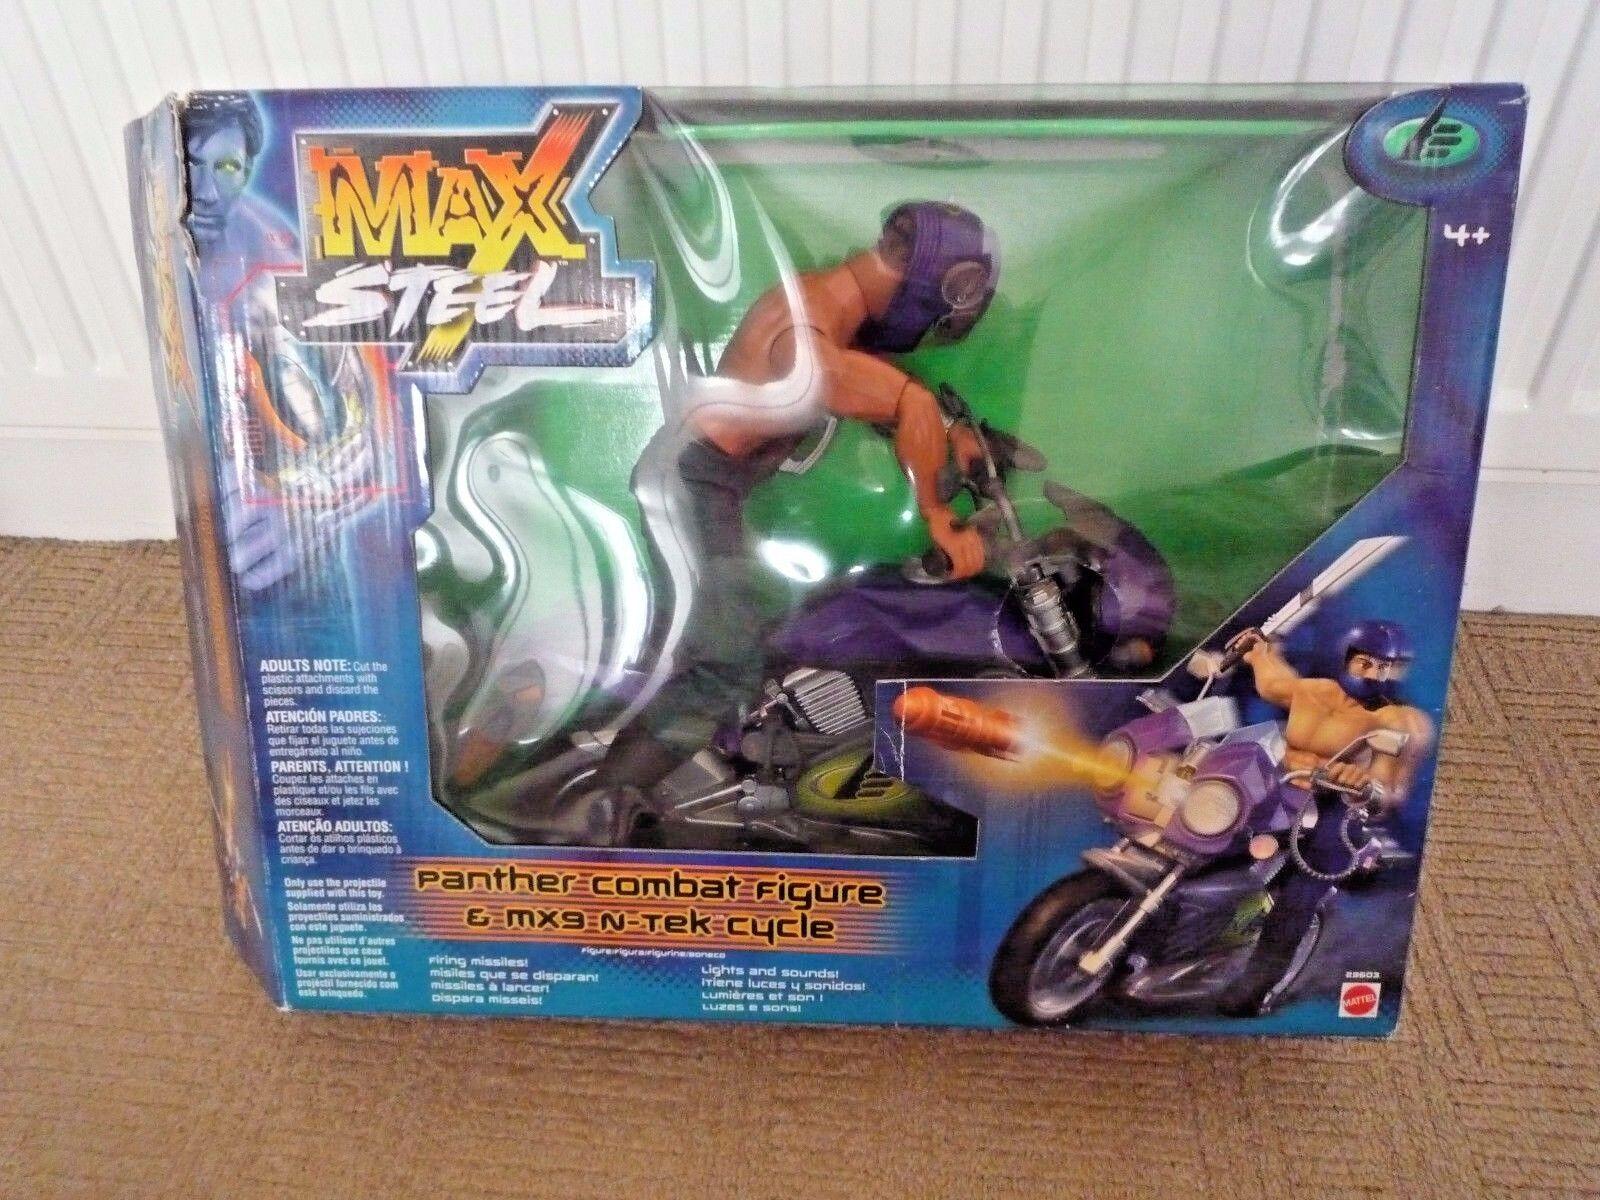 VINTAGE MAX STEEL PANTHER COMBAT FIGURE WITH MX9 N-TEK MOTORBIKE & ORIGINAL BOX